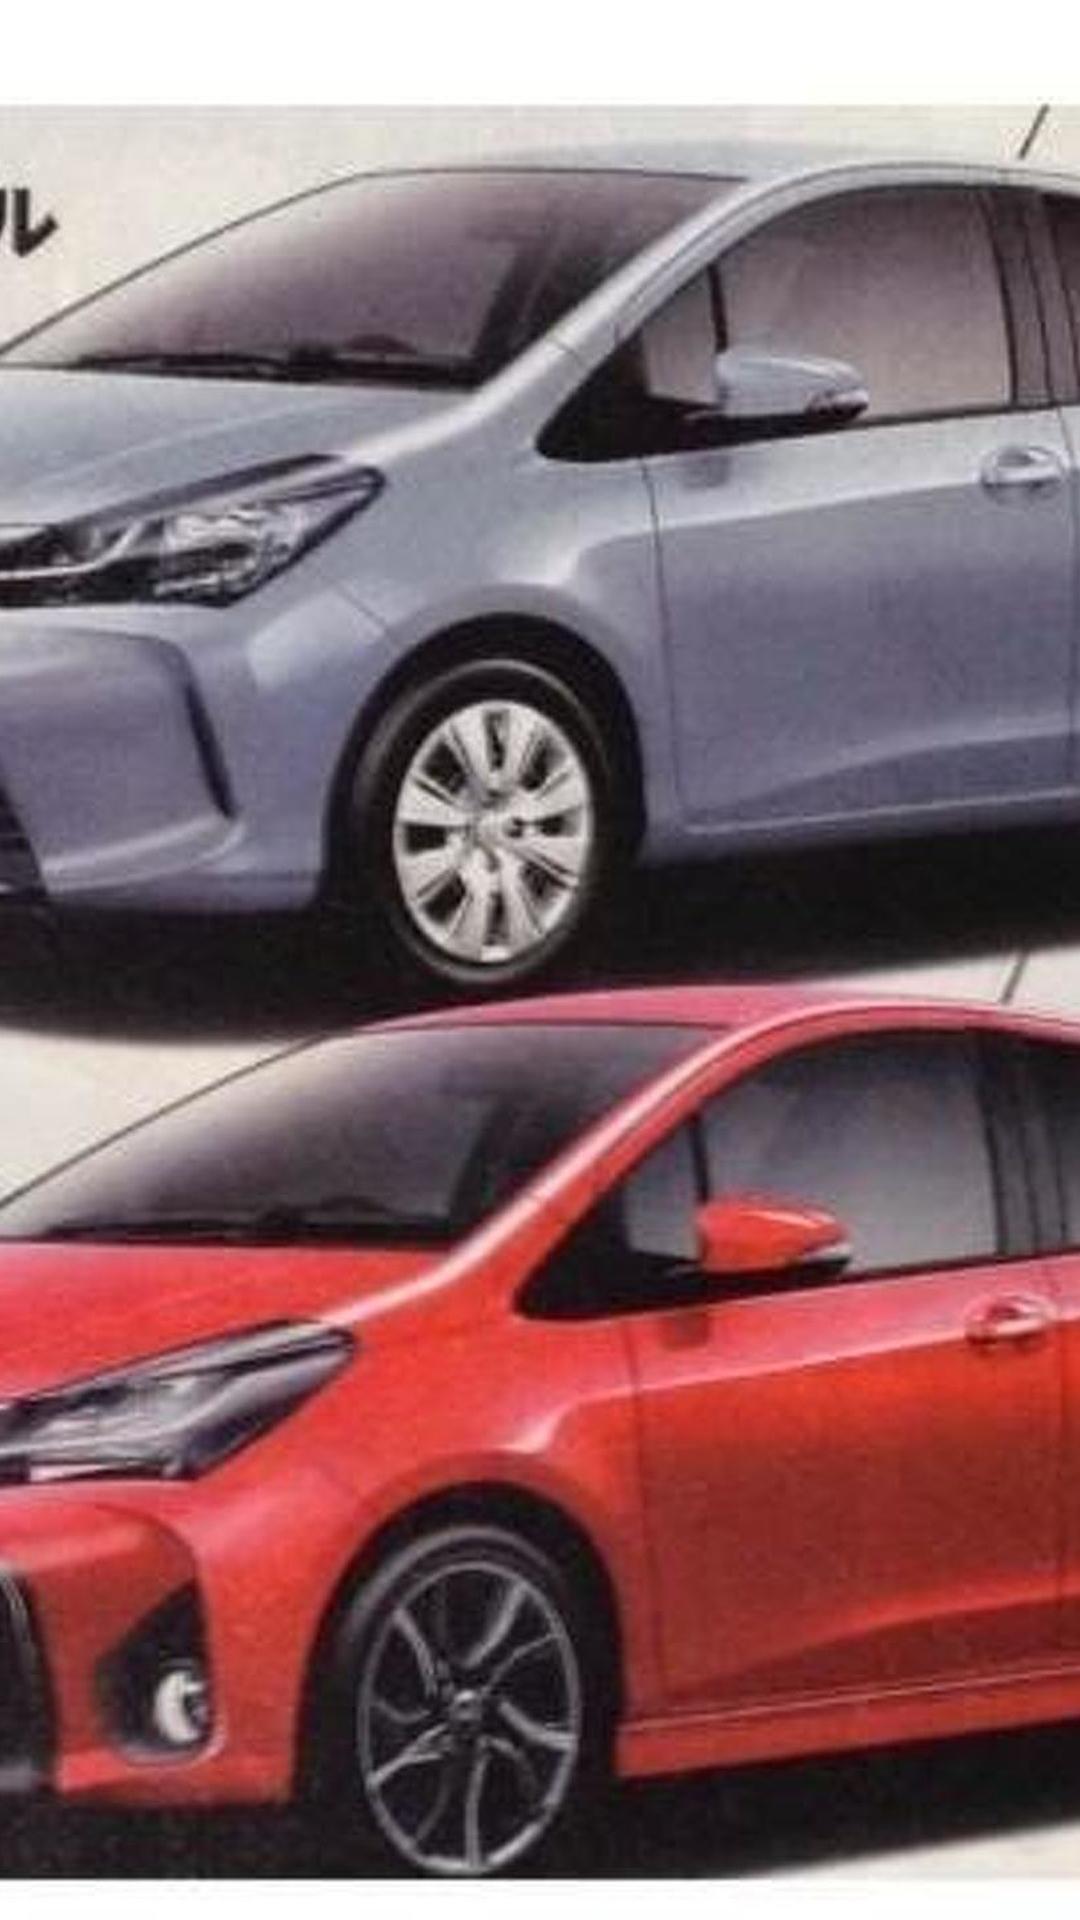 Toyota Vitz/Yaris facelift leaked in brochure scans